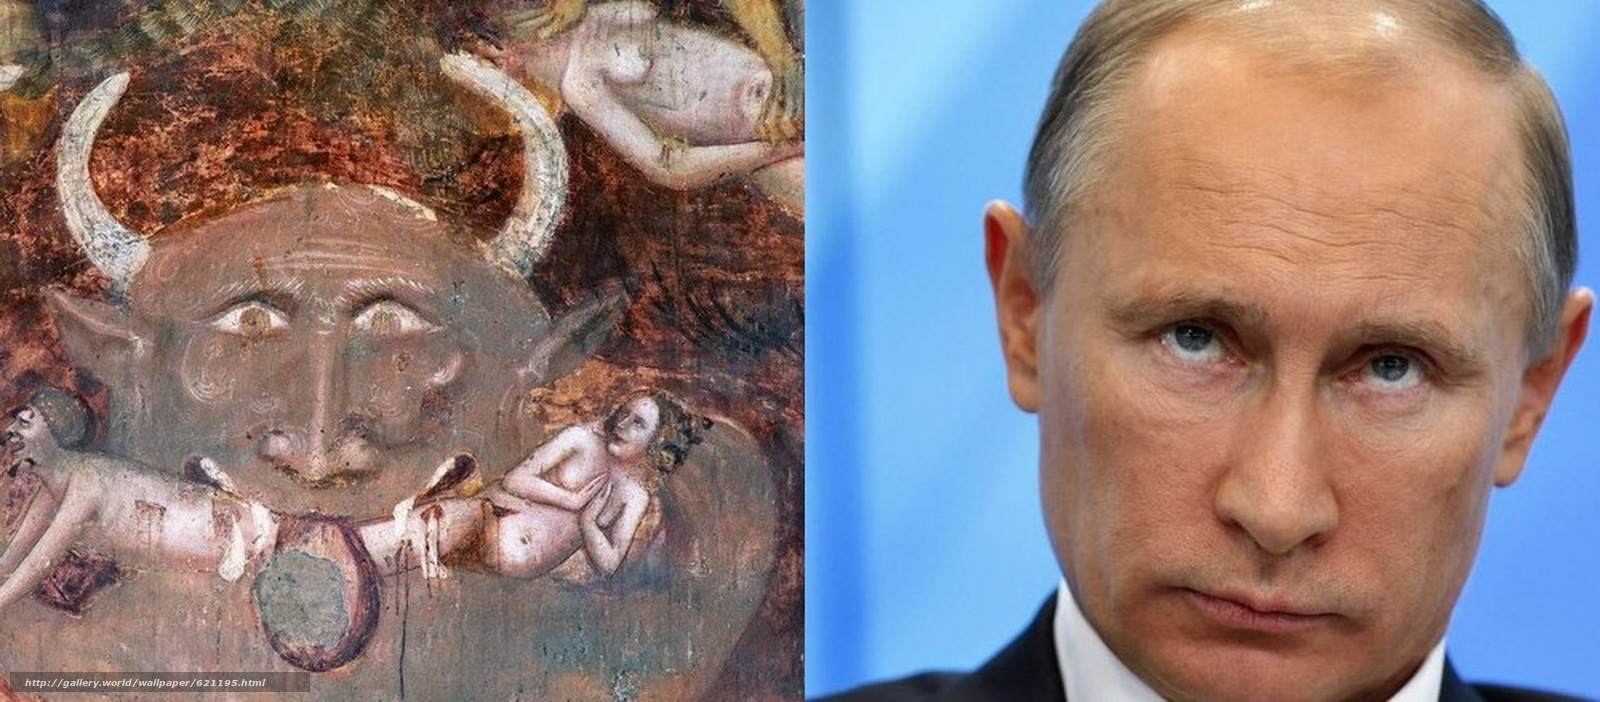 Скачать на телефон обои фото картинку на тему фреска, 14 век, антихрист, путлер, разширение 2050x900